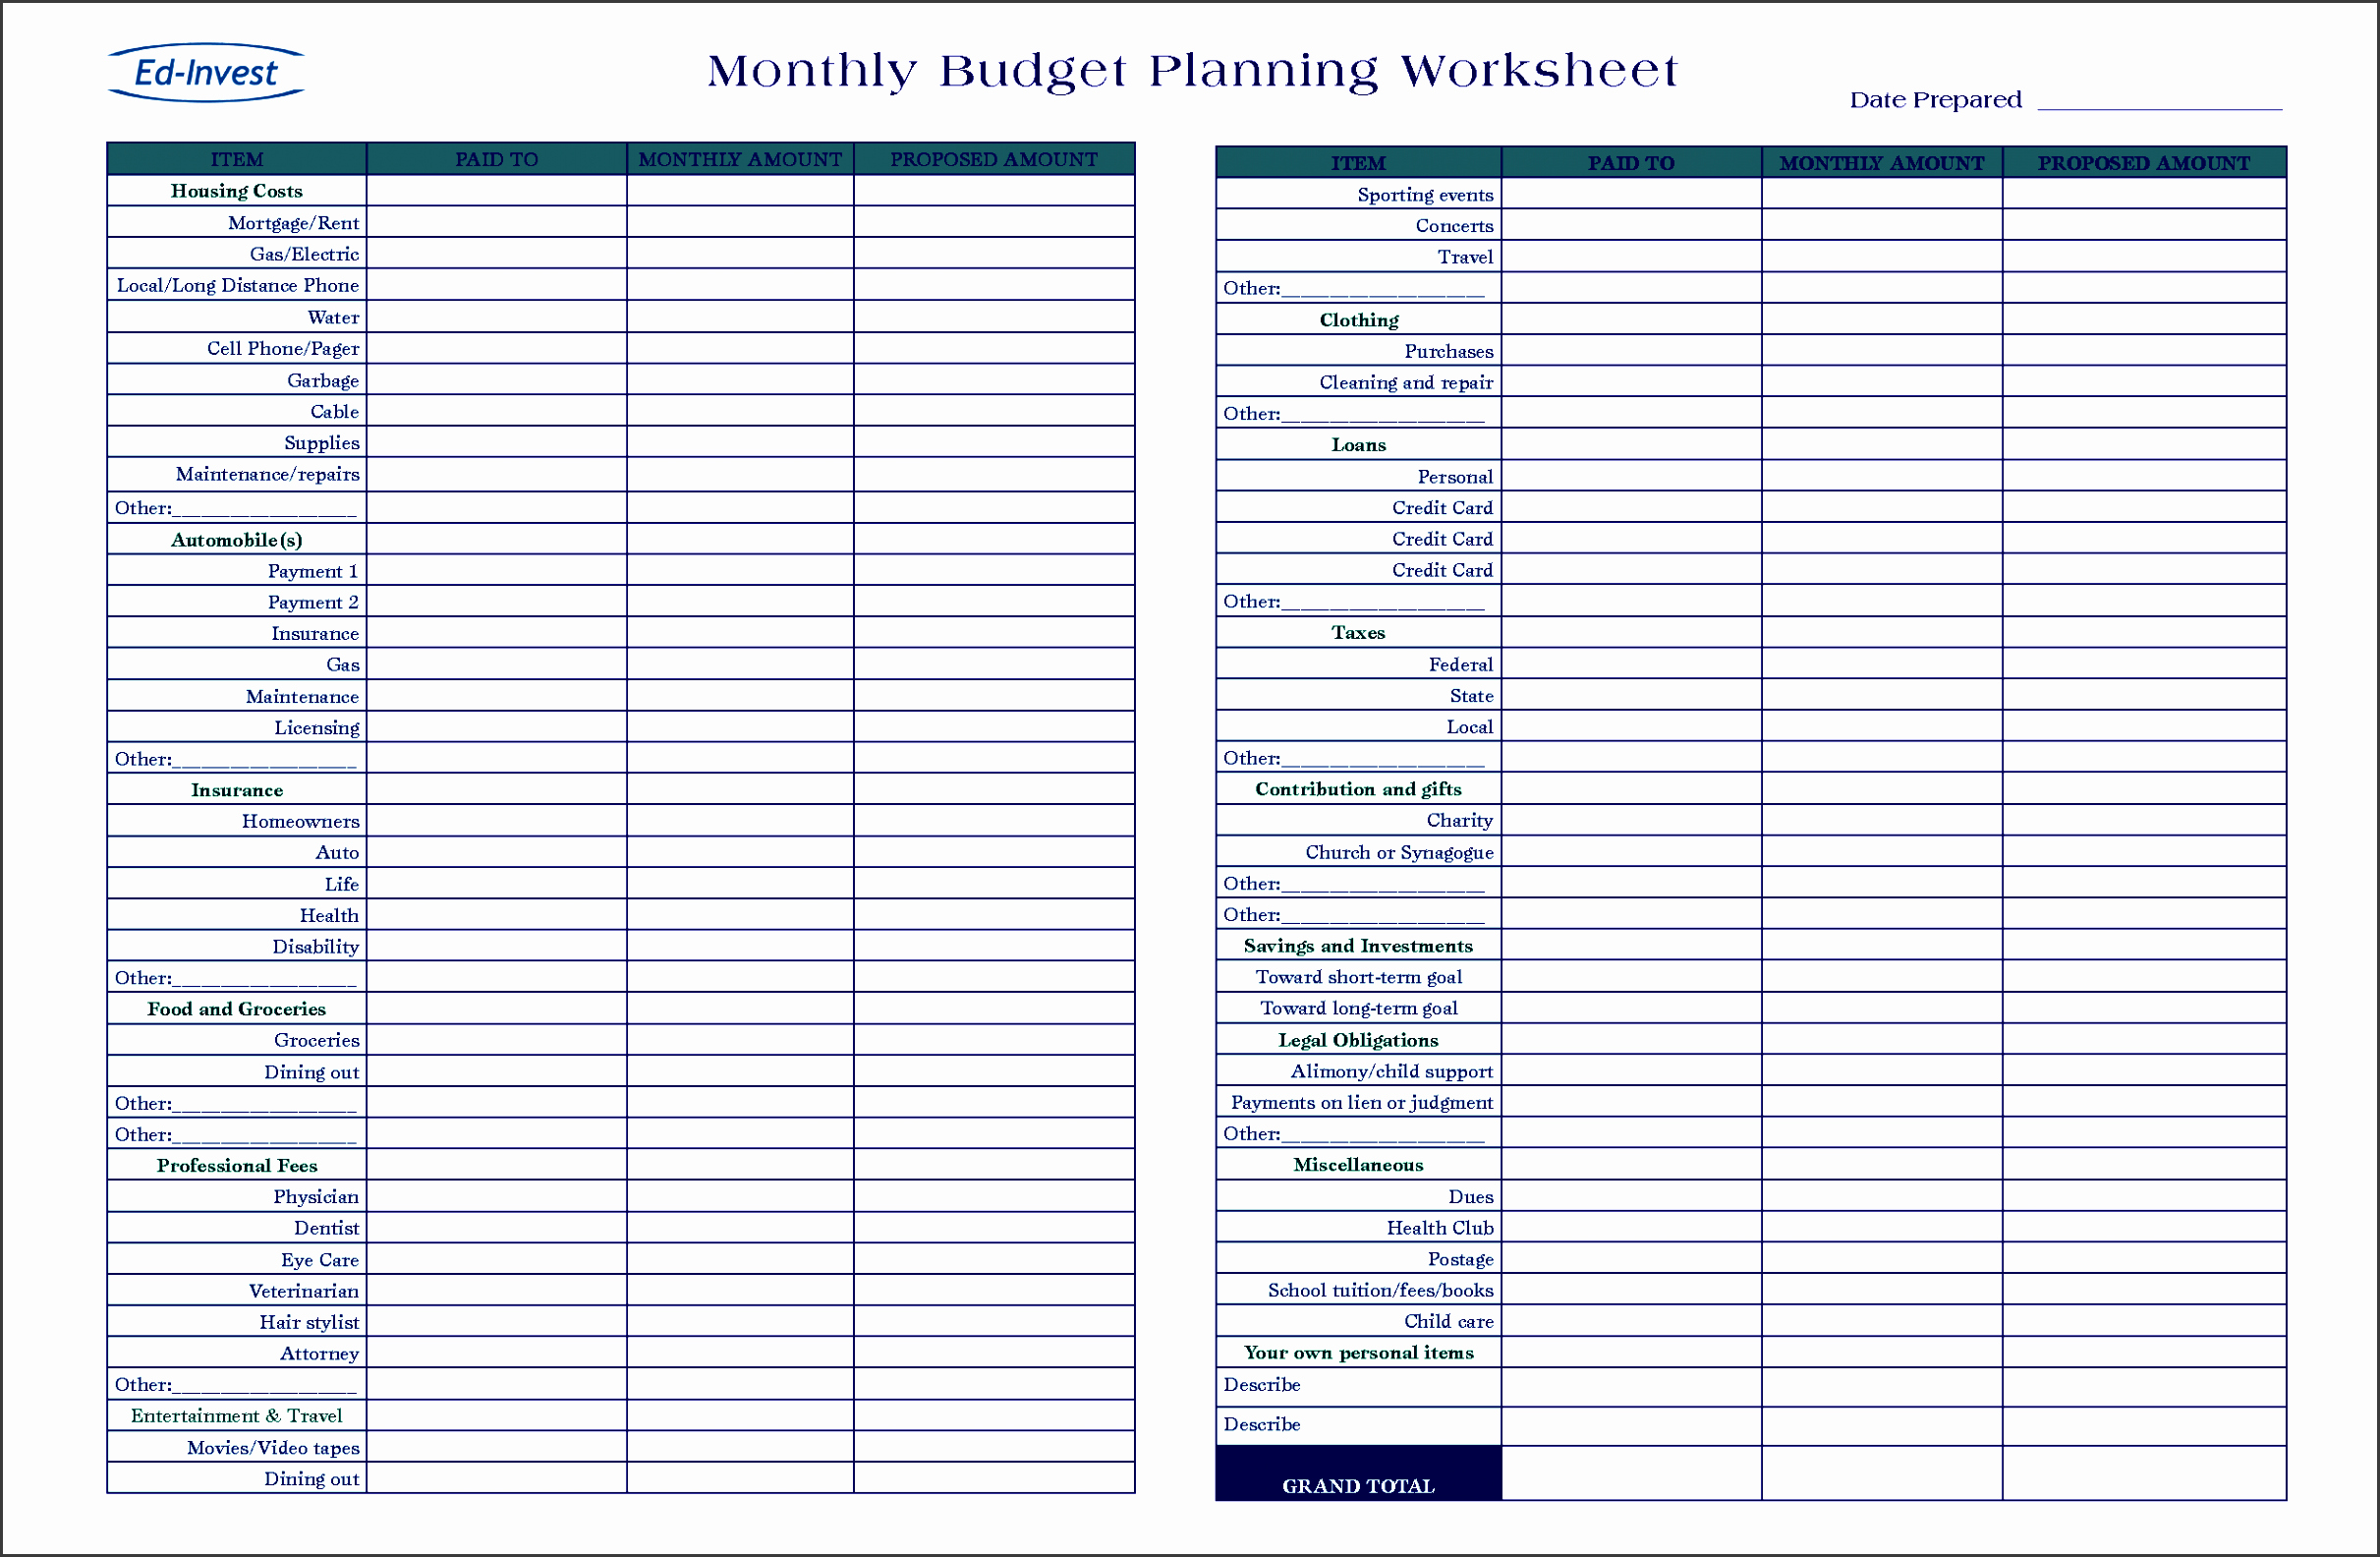 Church event Planning Checklist Fresh 11 Free Church event Planning Checklist Template to Download Sampletemplatess Sampletemplatess